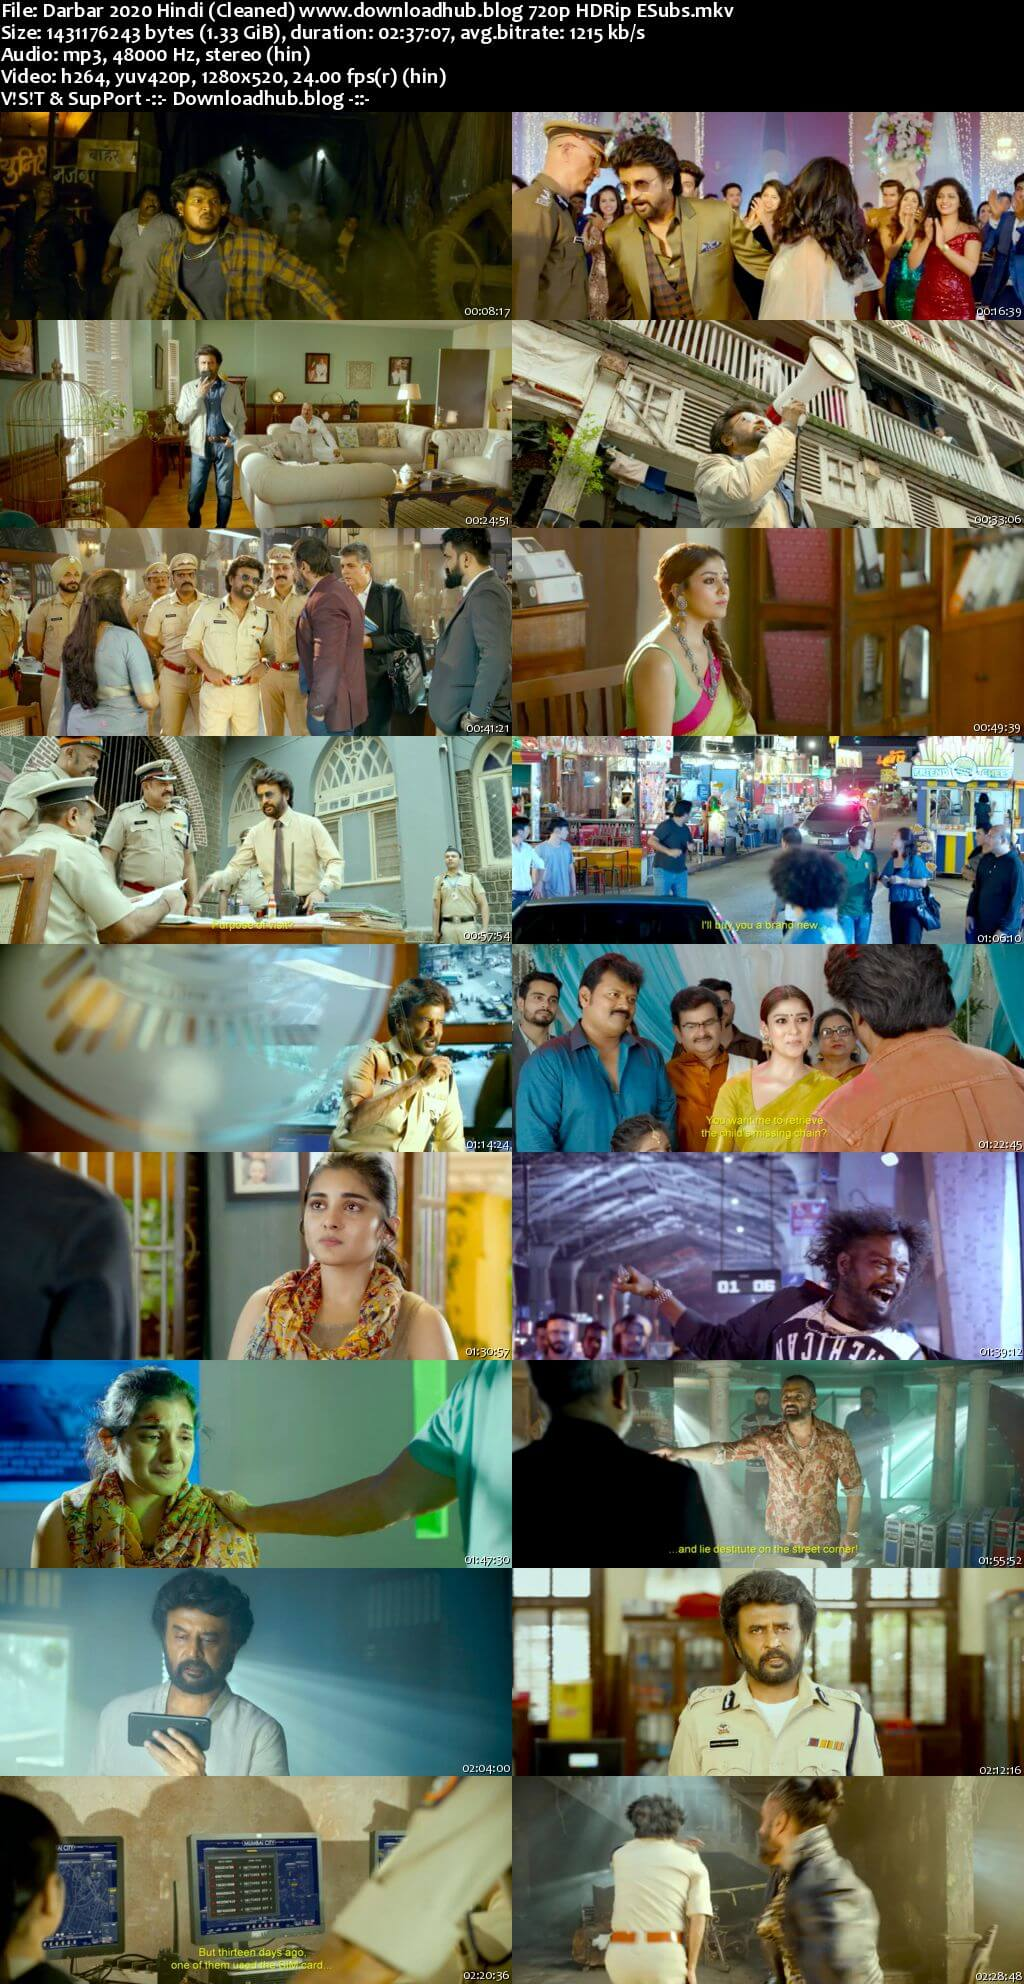 Darbar 2020 Hindi (Cleaned) 720p HDRip HC ESubs